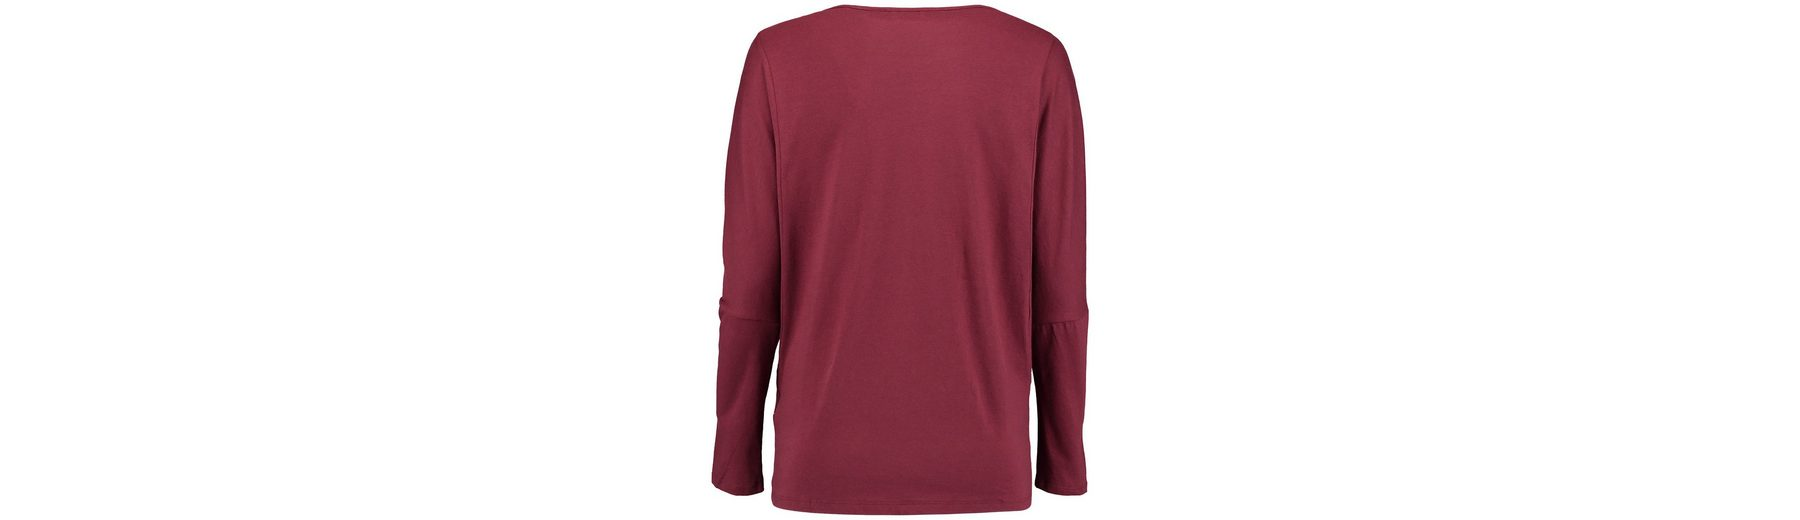 O'Neill T-Shirt langärmlig Squaw Valley Günstiger Preis Auslass Verkauf Günstig Kaufen Angebote Verkauf Niedrig Kosten Billig Verkauf Rabatt Neuesten Kollektionen 3cIXTlWG